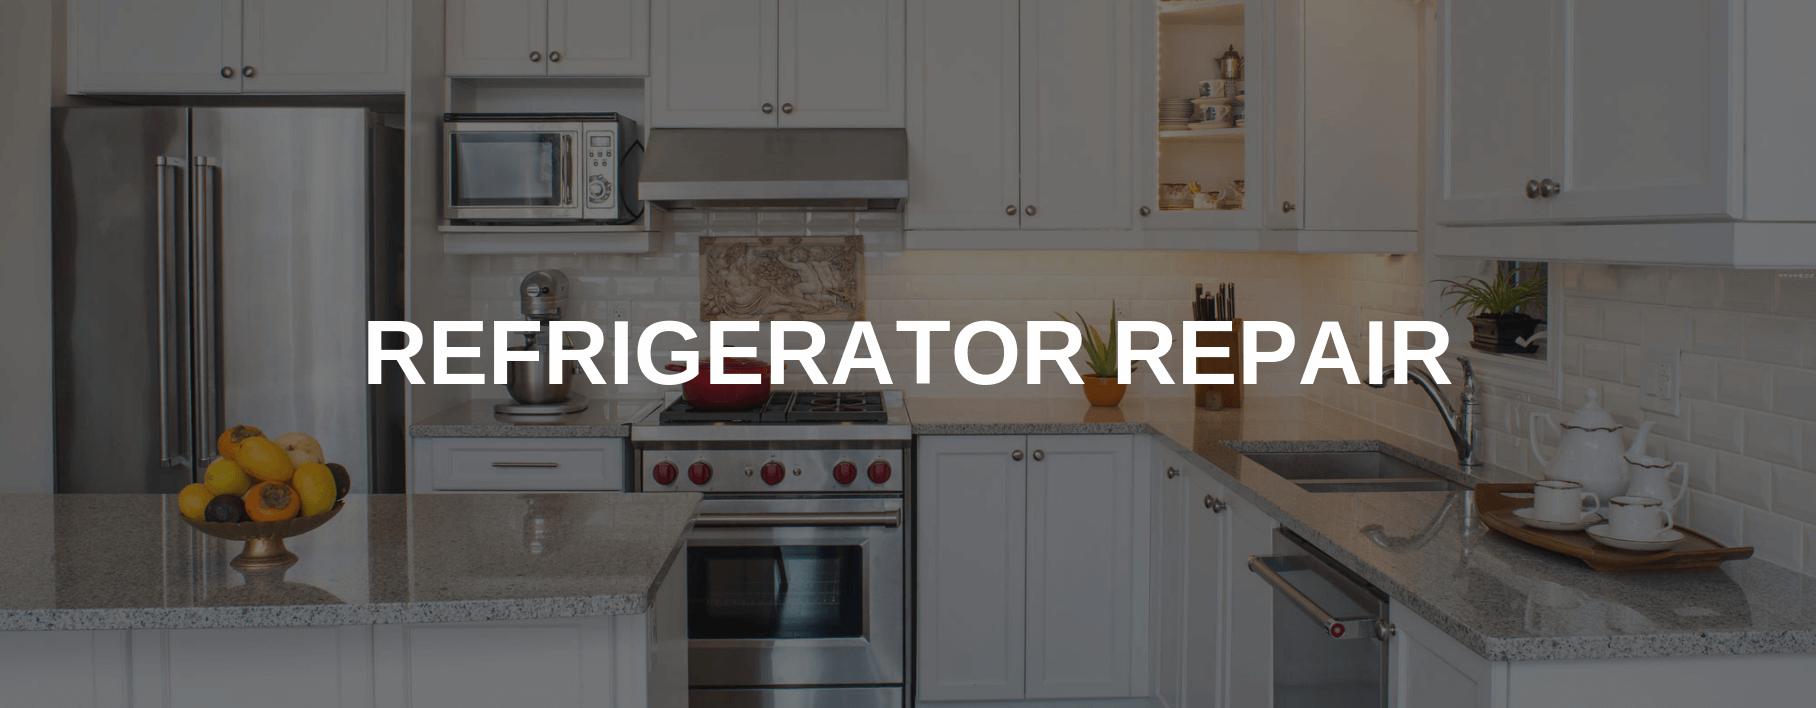 refrigerator repair new britain